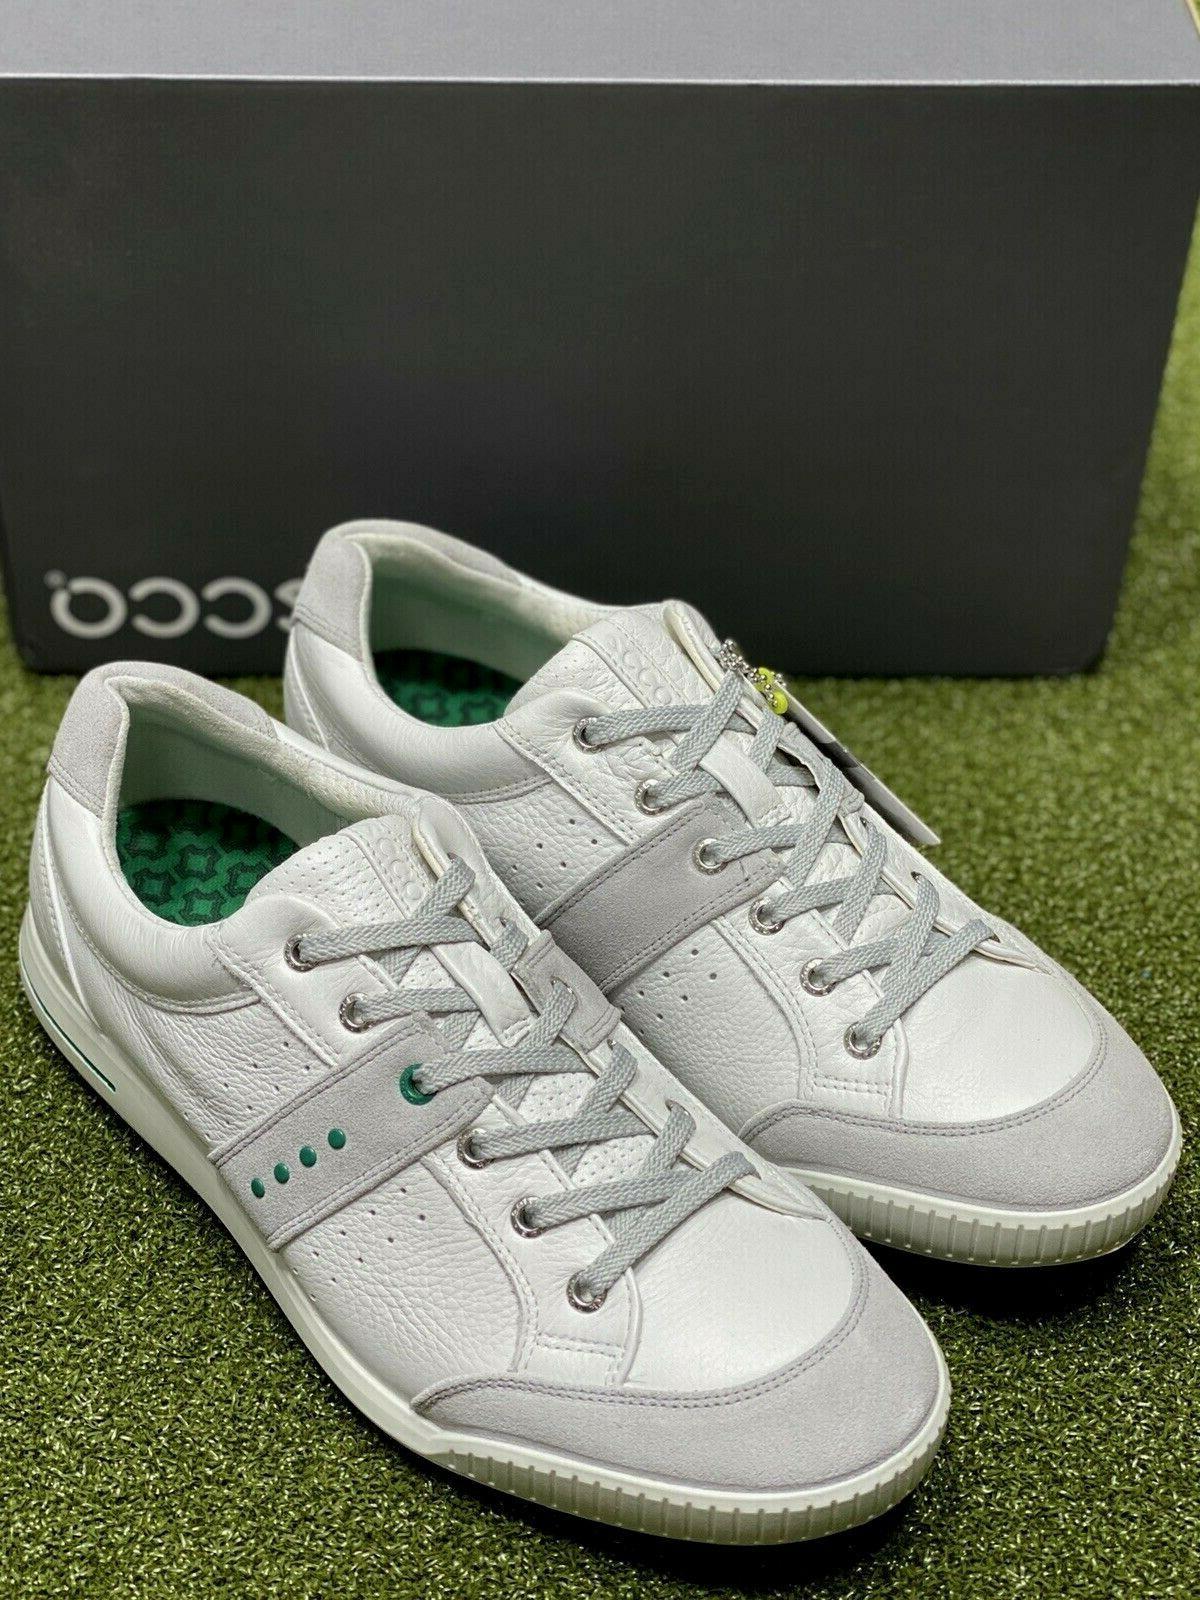 ECCO Street Fred Couples Shoes 43 NIB